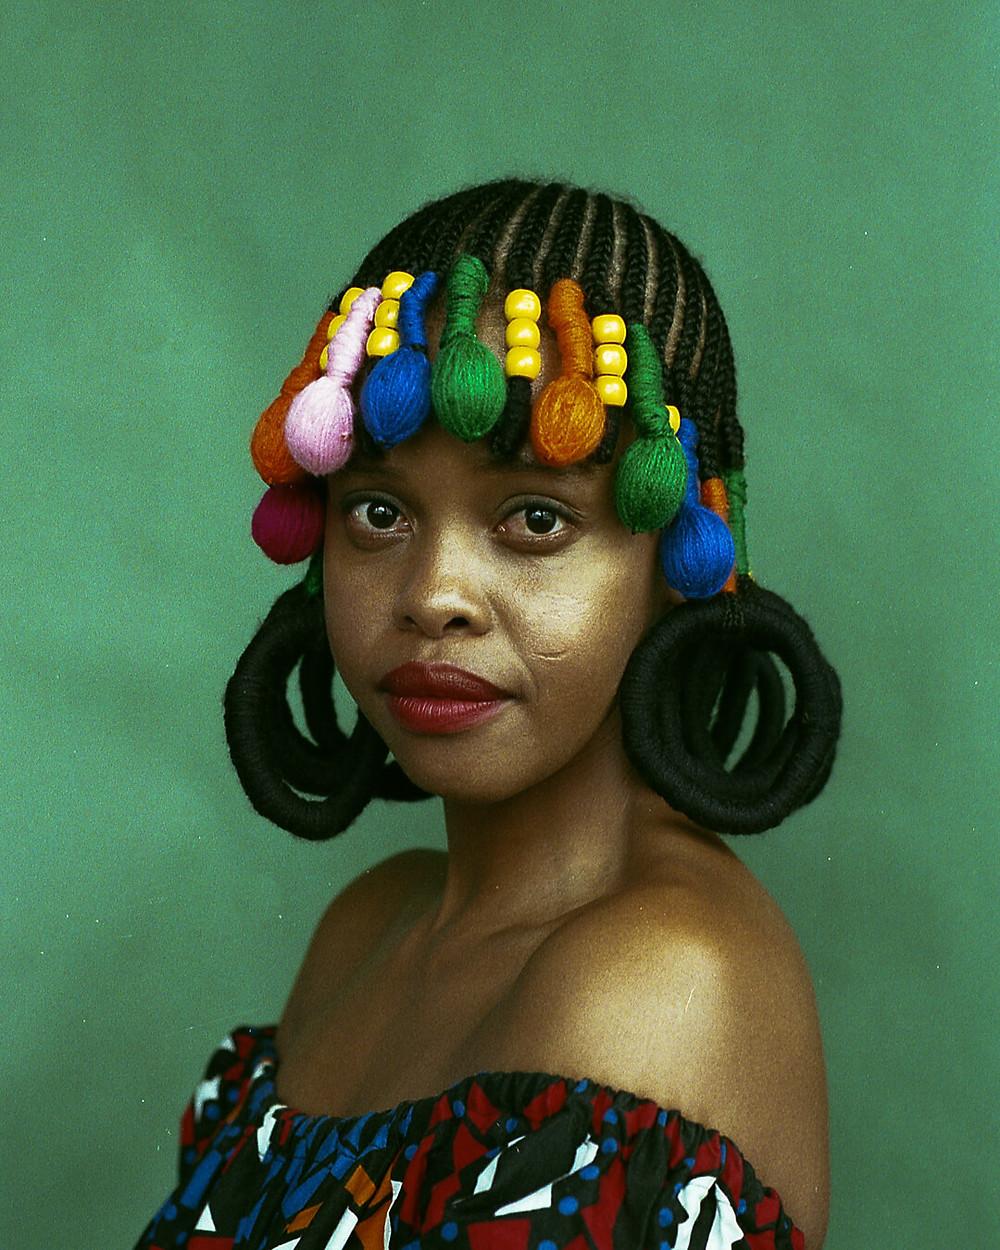 Nikiwe Dlova Hair Stylise by Nikiwe Dlova